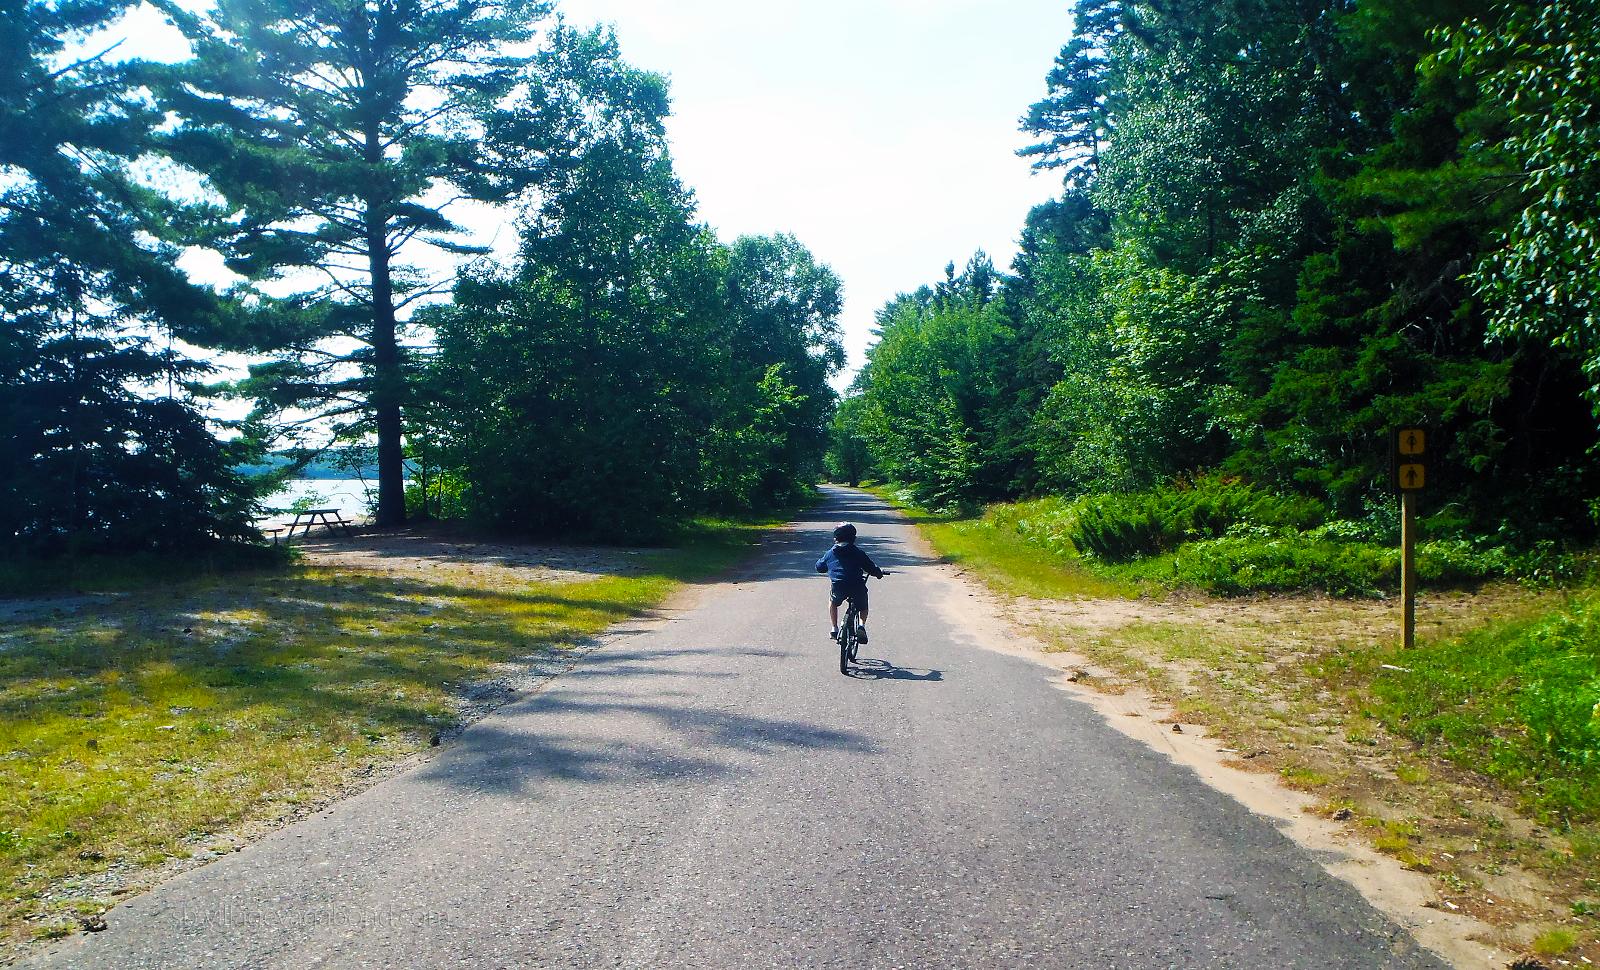 Bike riding alongside Lake Superior at Batchawana Bay Provincial Park.